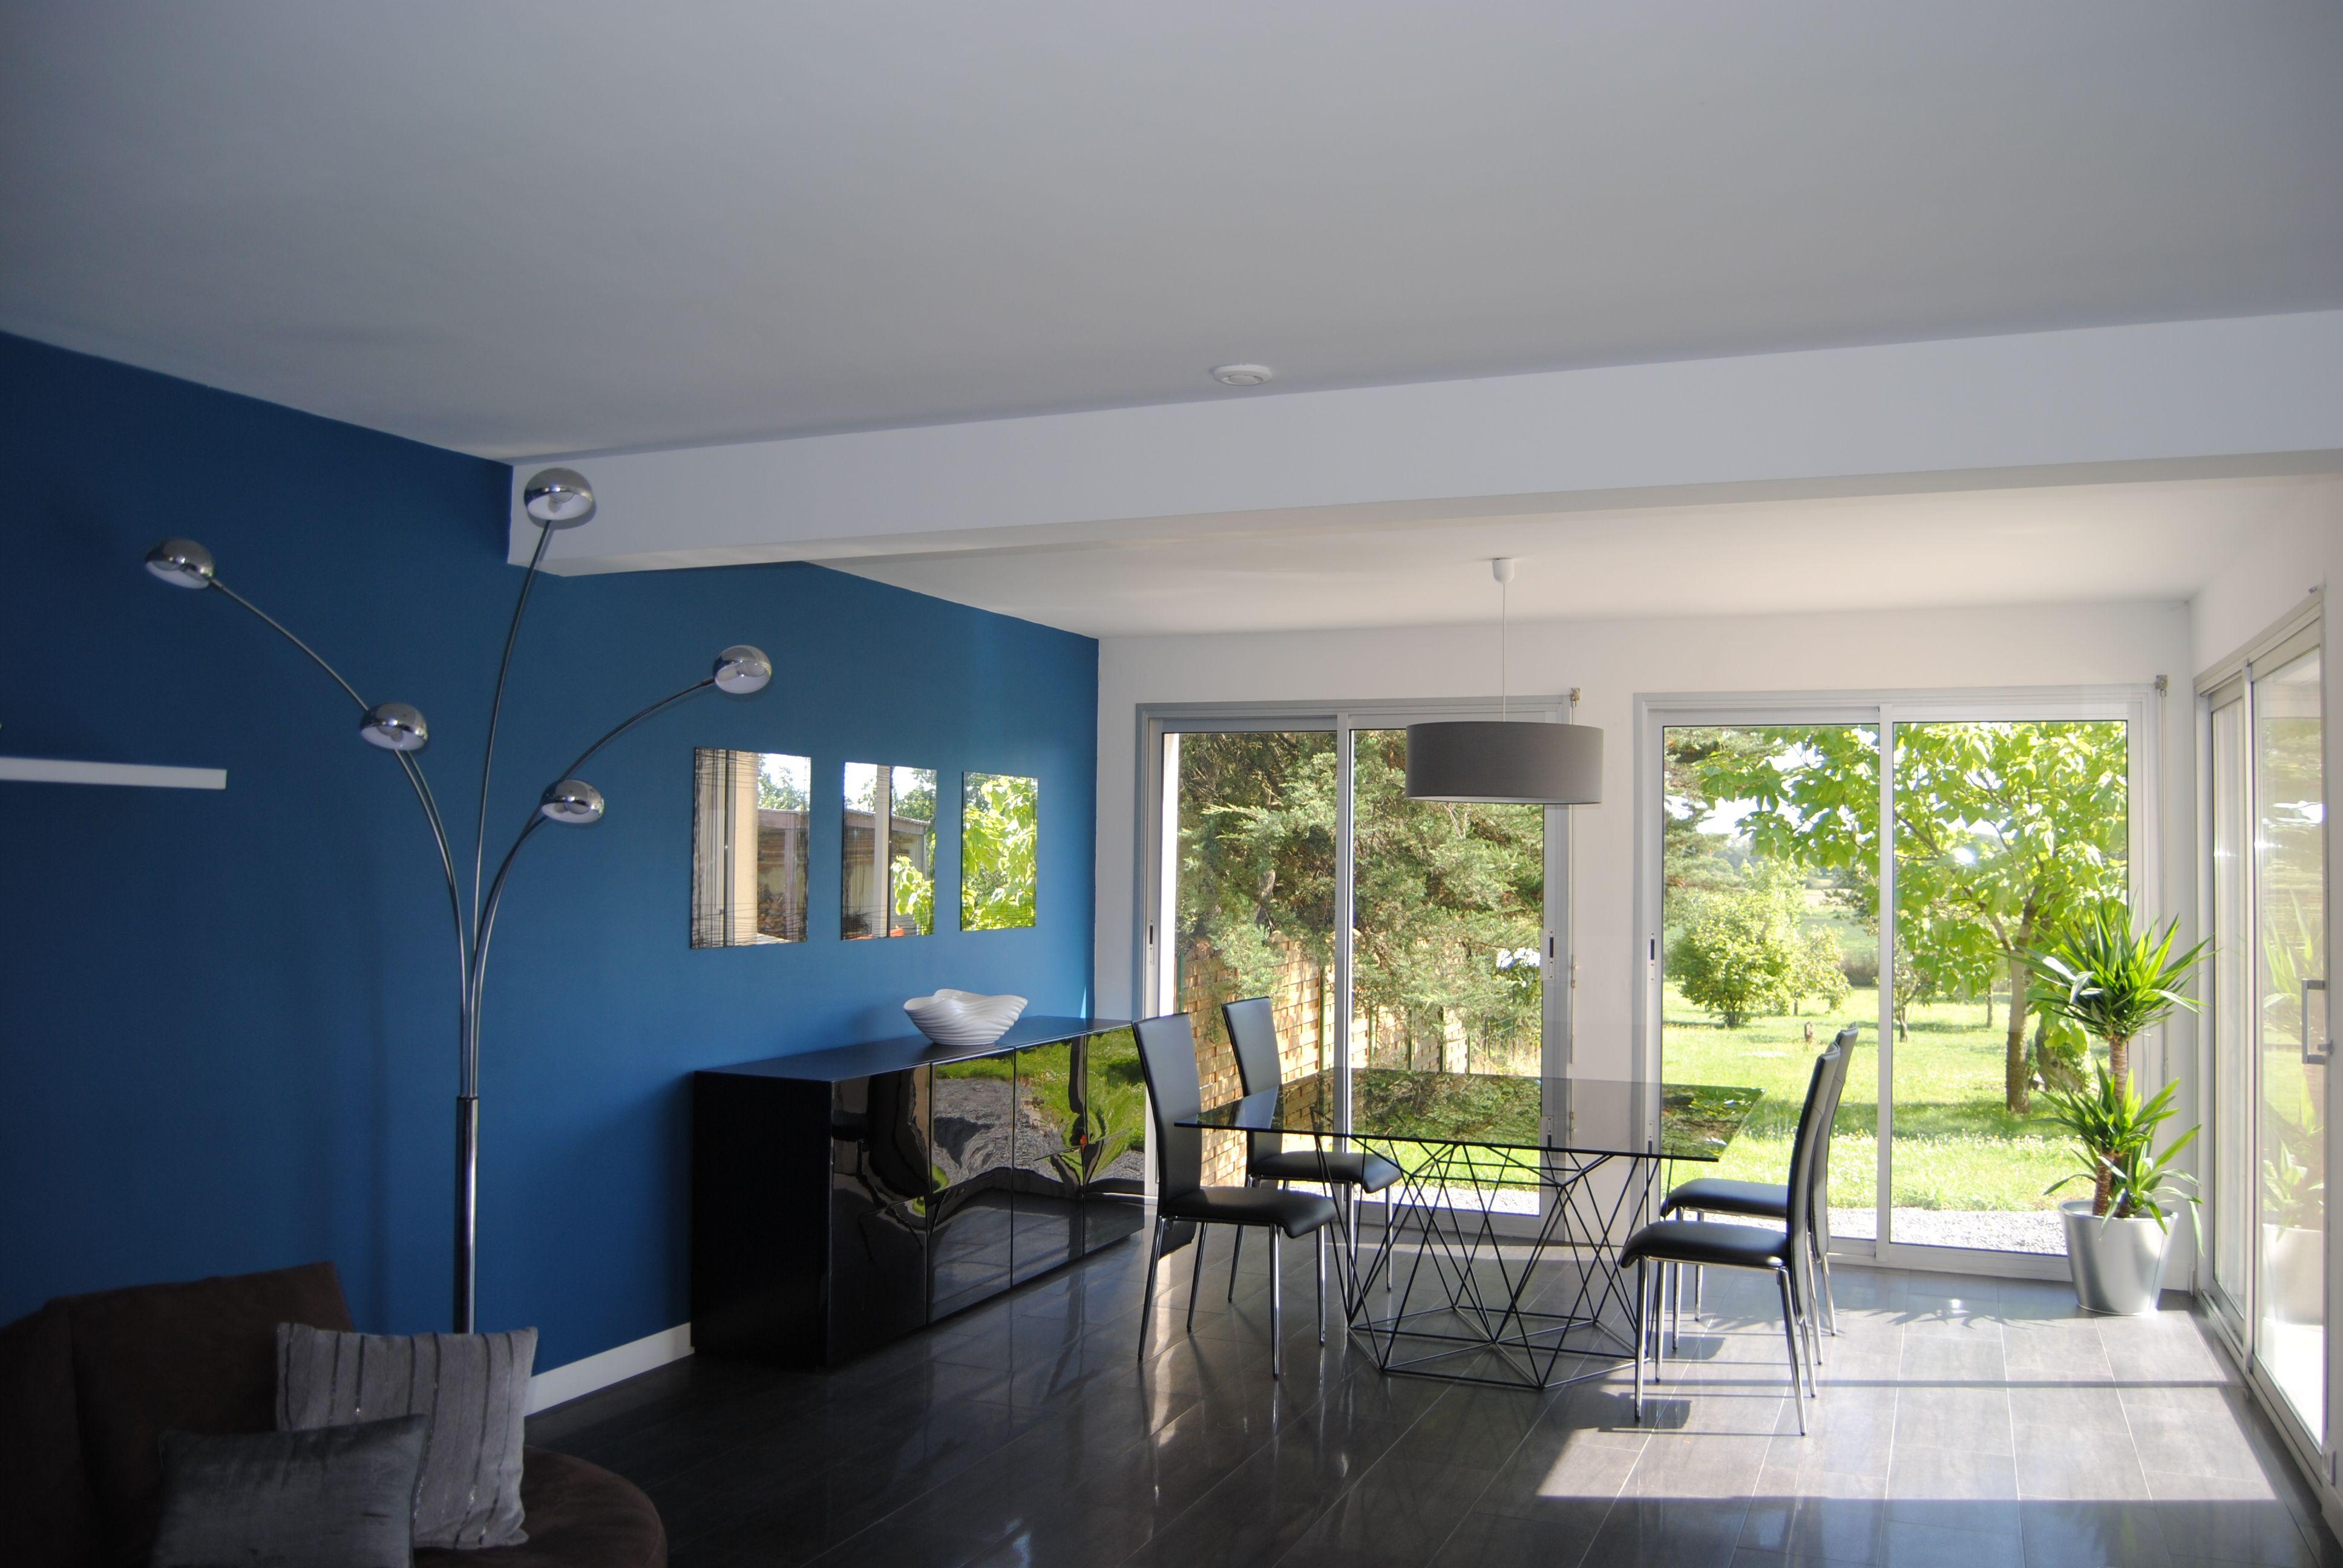 Mobile partie salle manger 3872 2592 pi ce for Salle a manger bleu canard